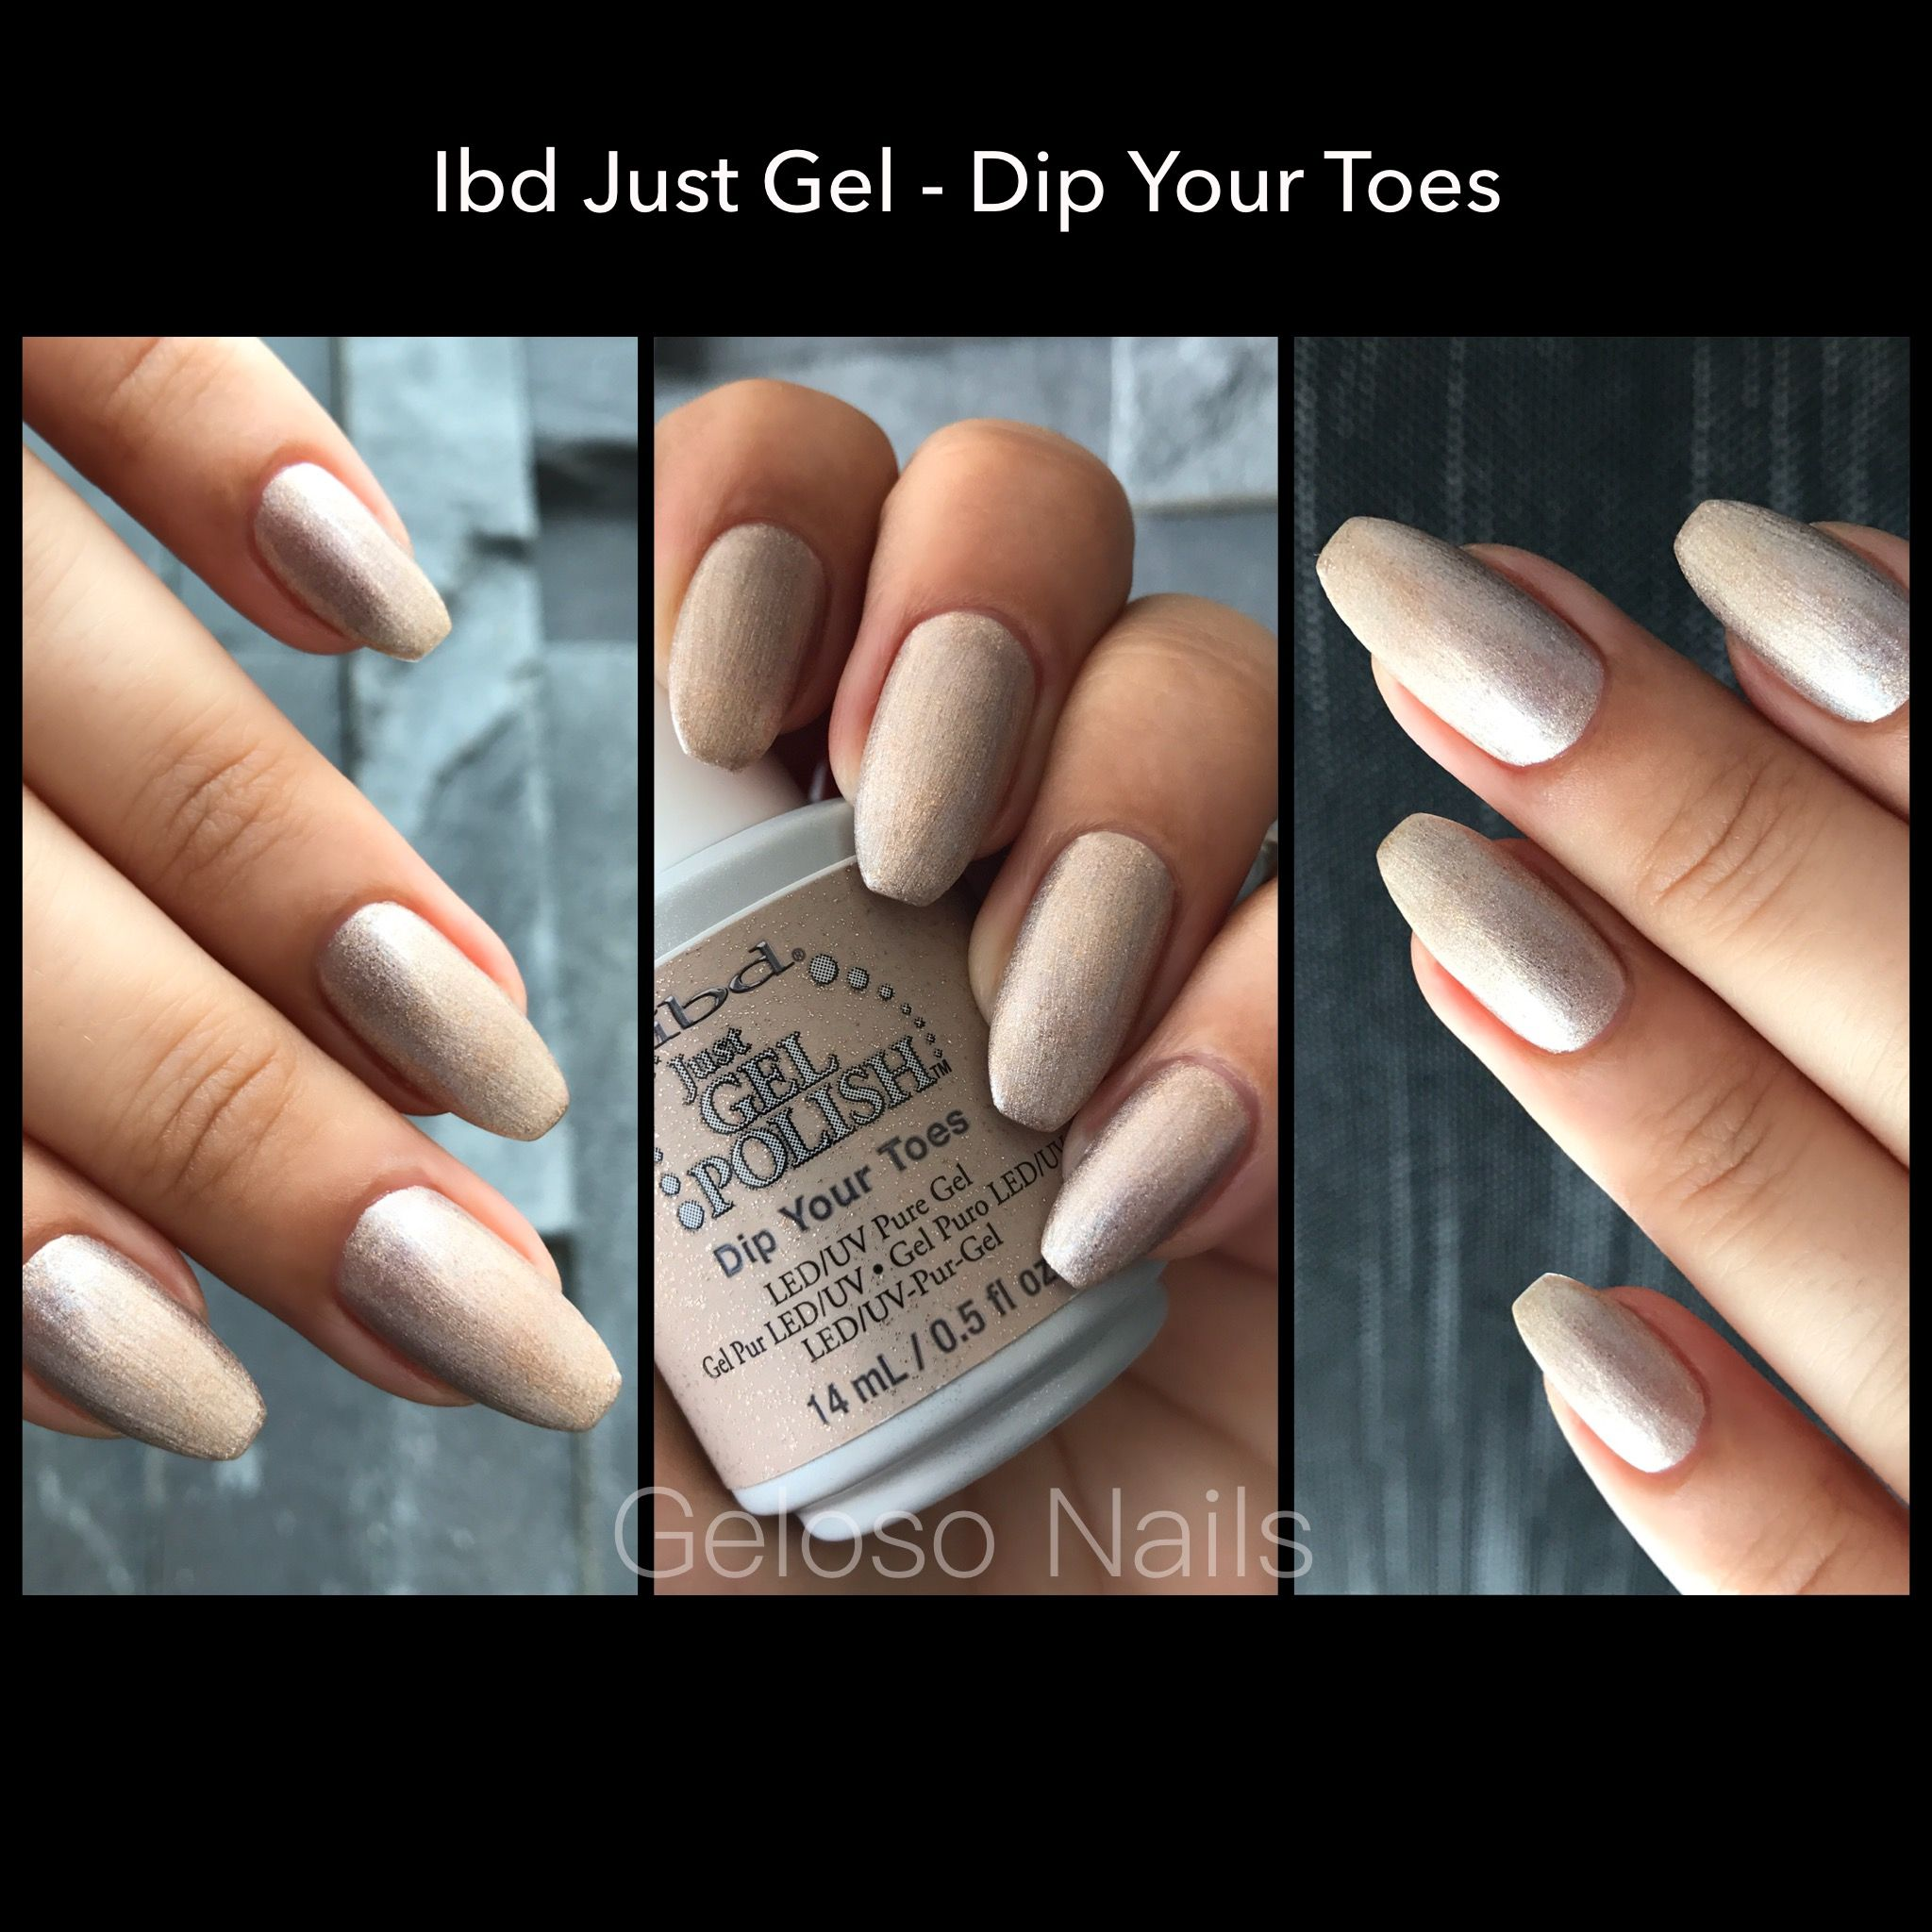 Ibd just gel polish dip your toes | Ibd Just Gel Swatches | Pinterest